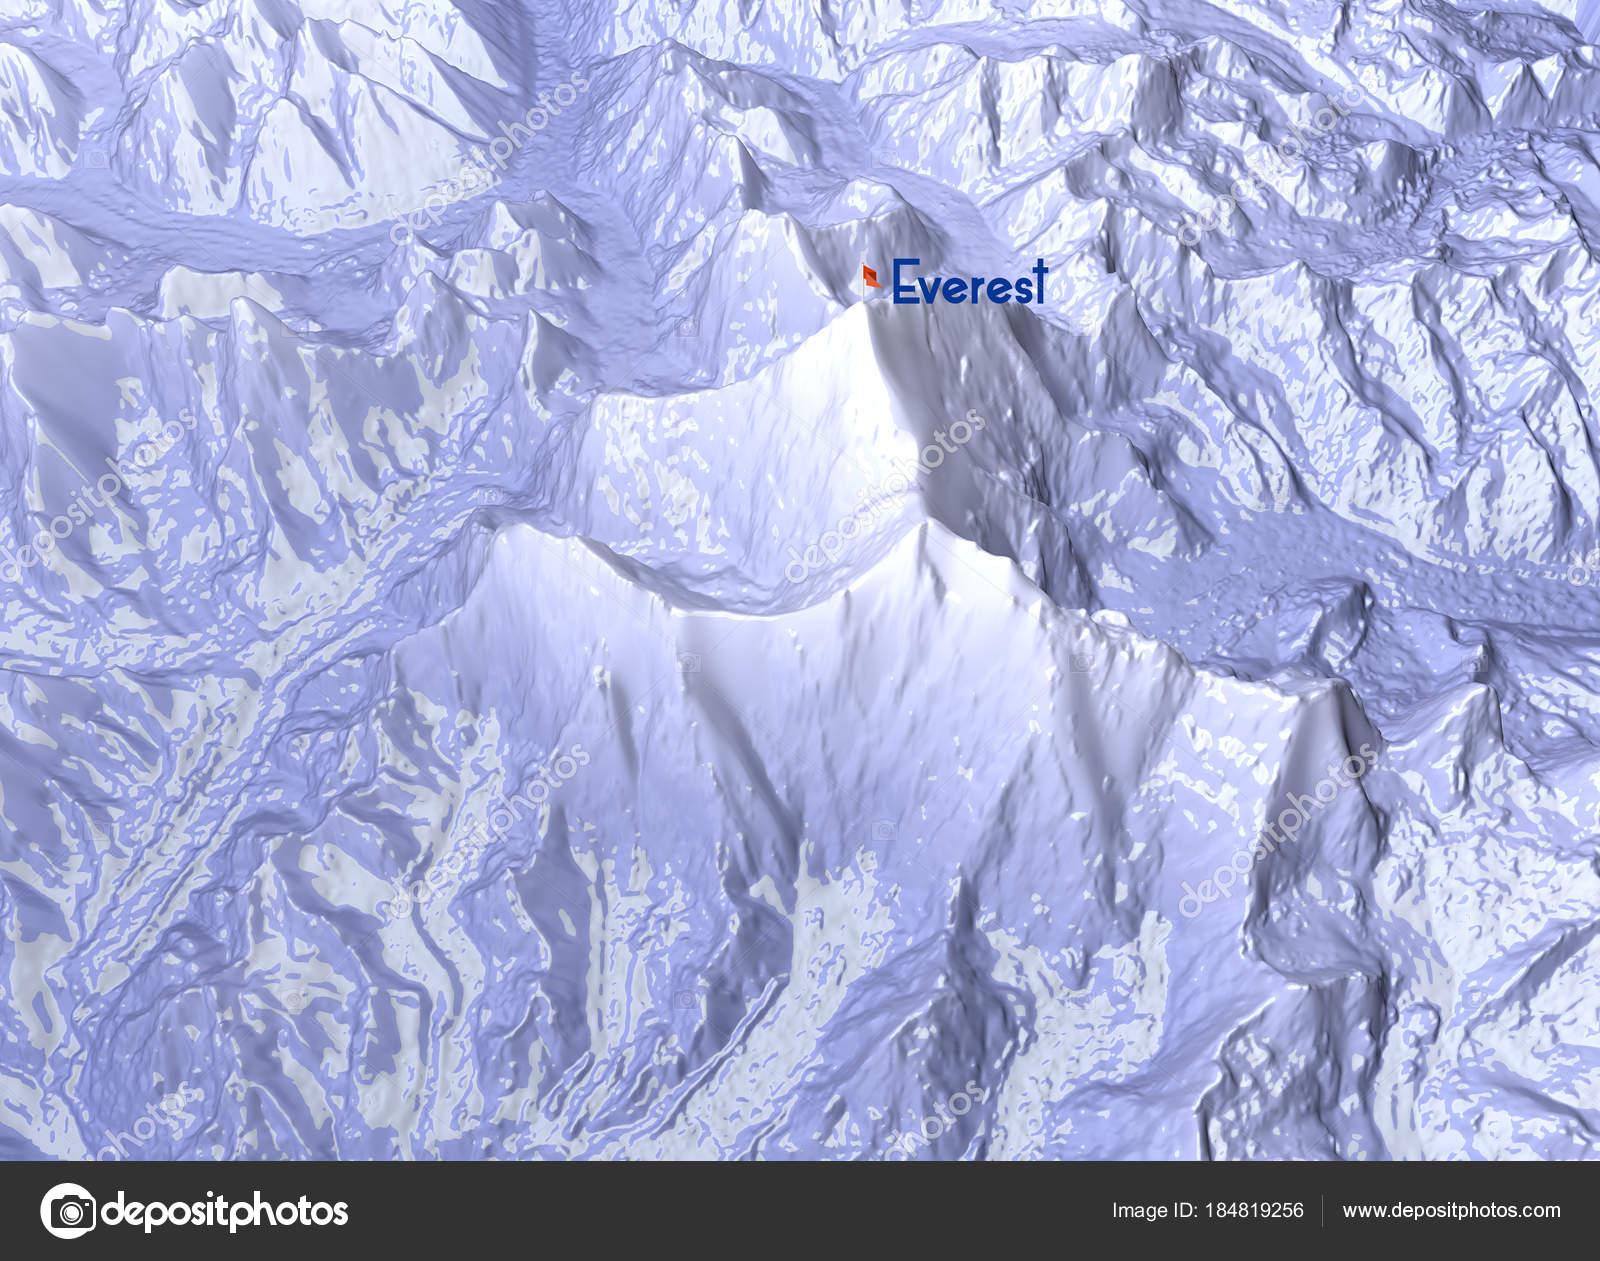 Himalaya Berge Karte.Mount Everest Relief Hohe Berge Himalaya Karte Stockfoto